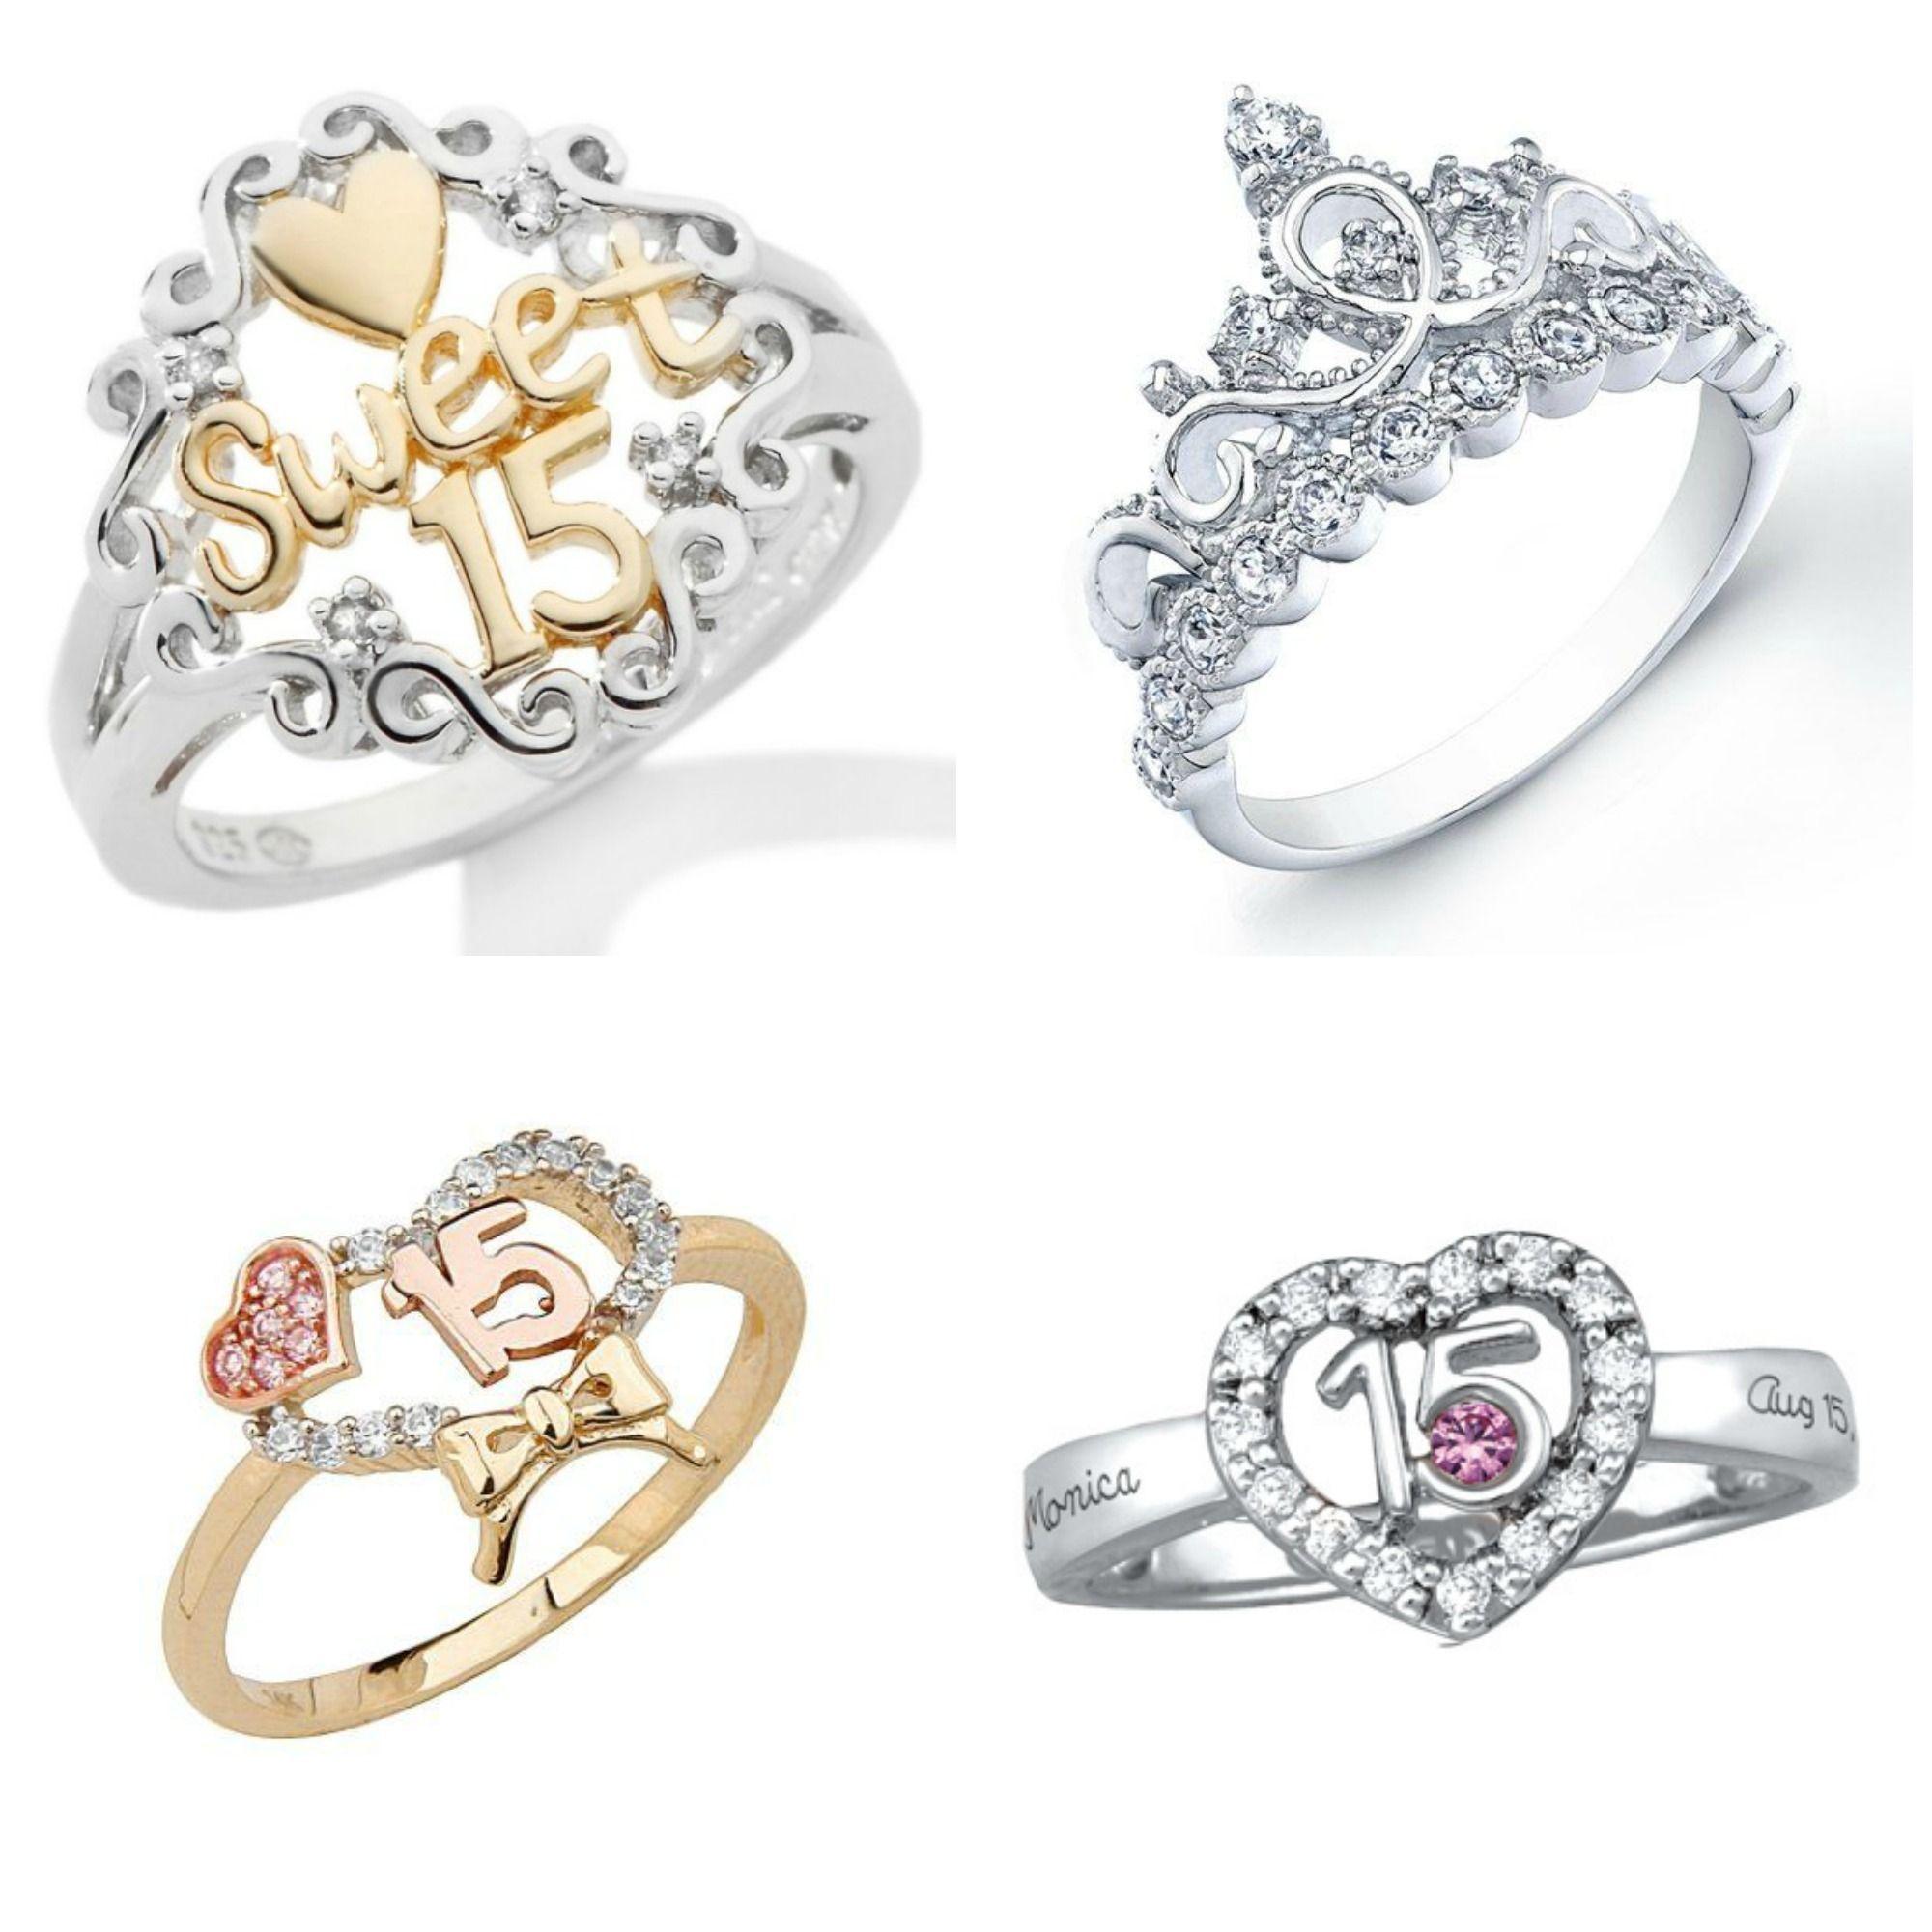 Inexpensive Jewelry Incorporate A Sense Of Splendor Plus